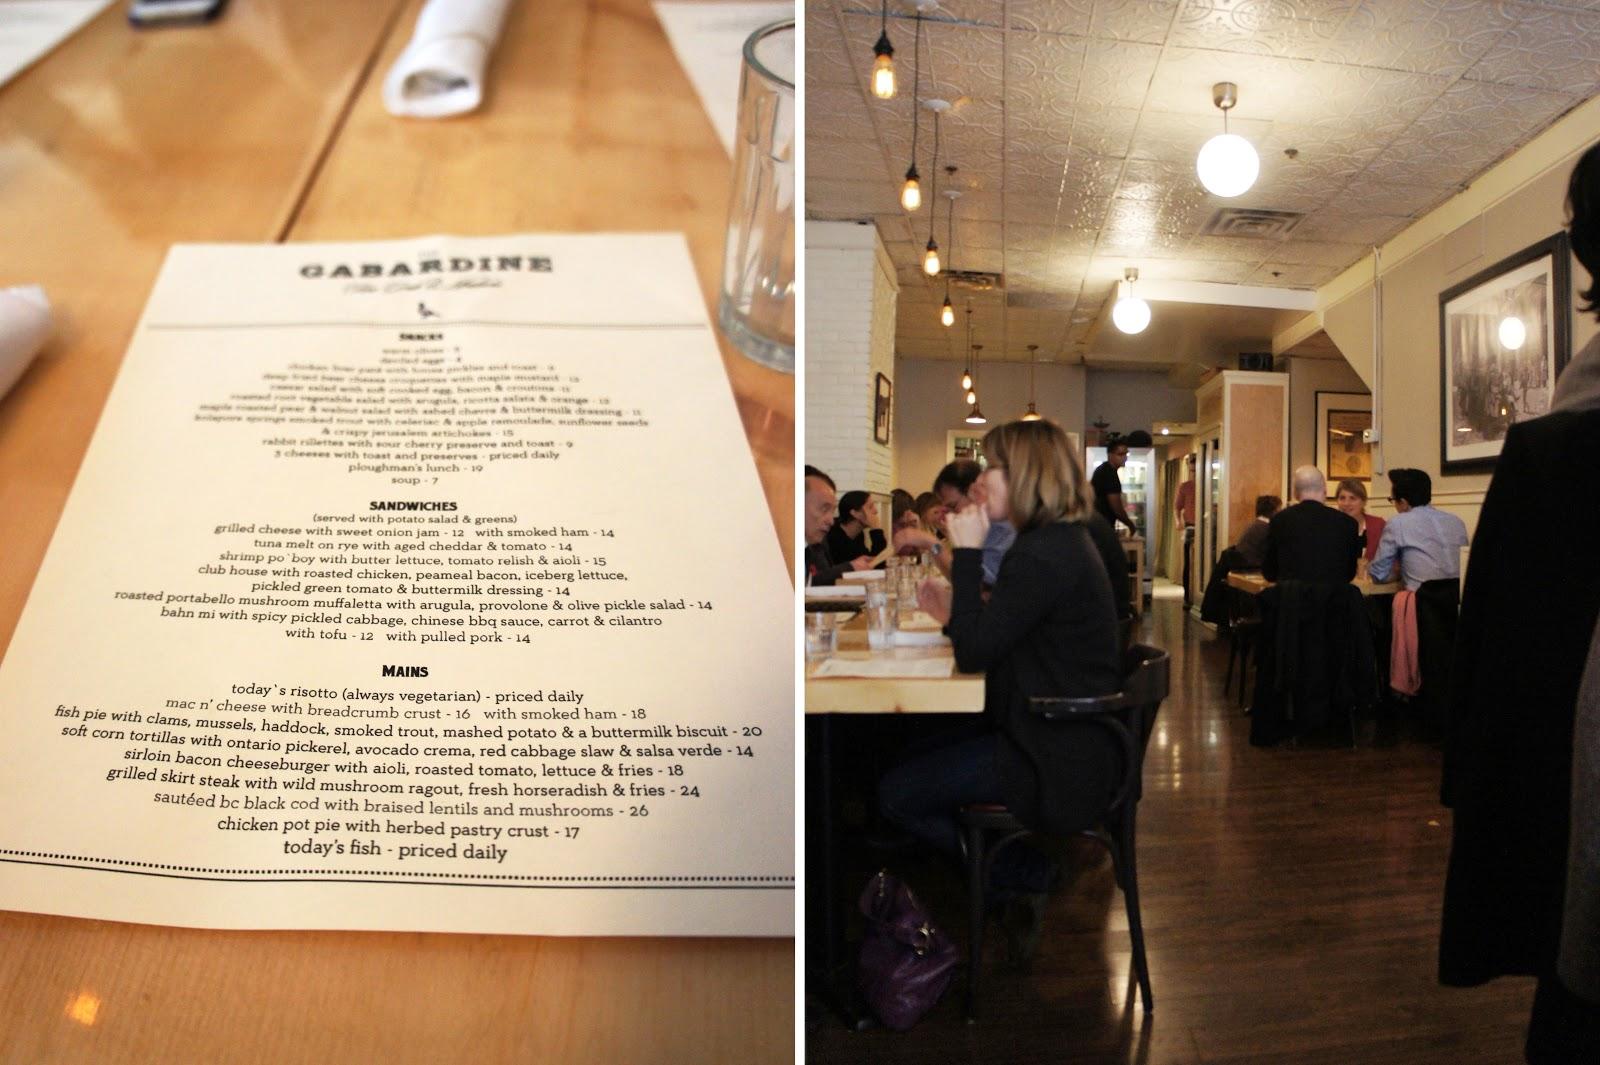 The Gabardine Restaurant and Menu